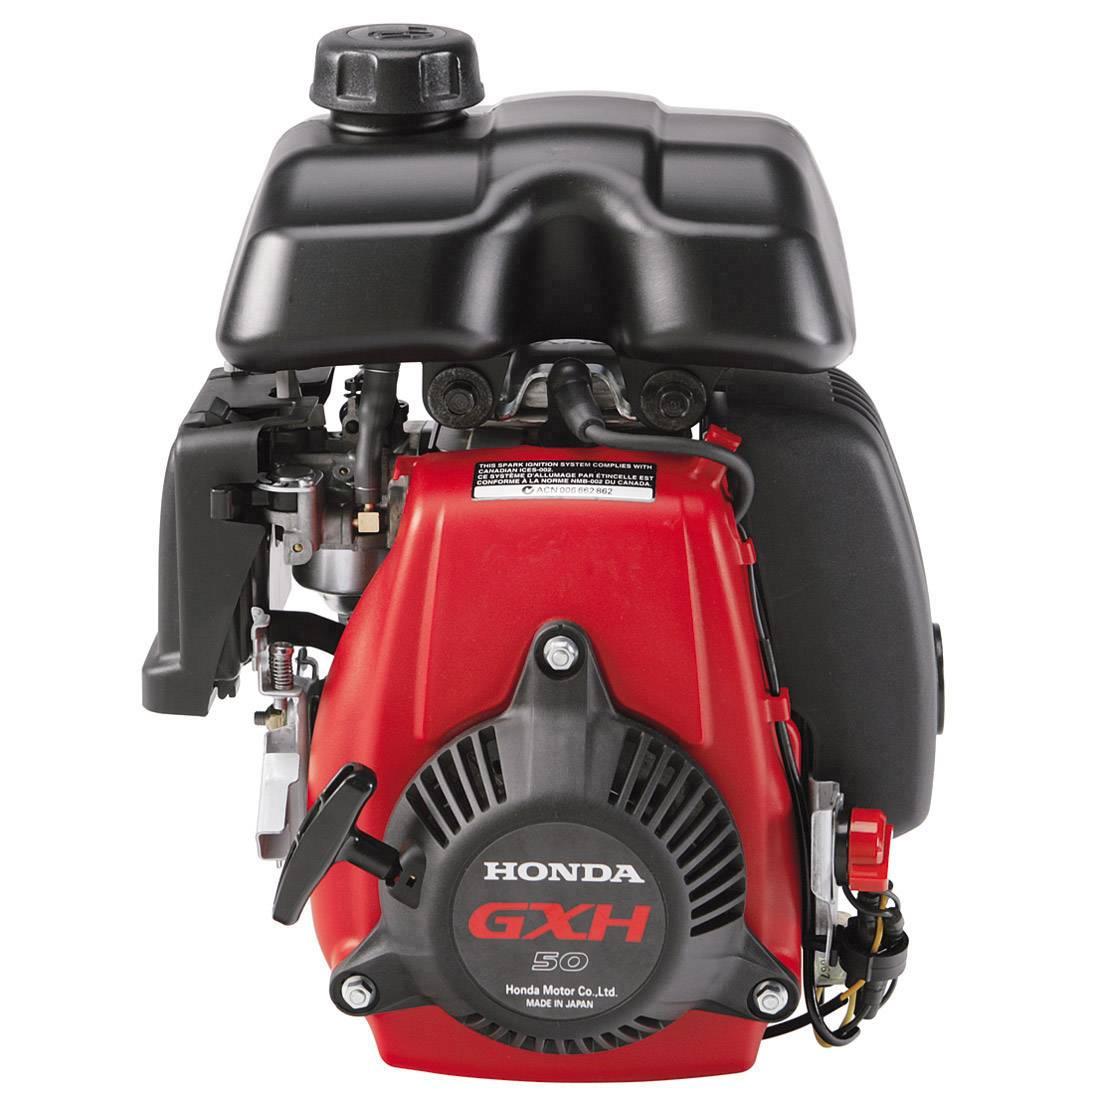 Honda GXH50 Air-Cooled 4-Stroke OHV Engine